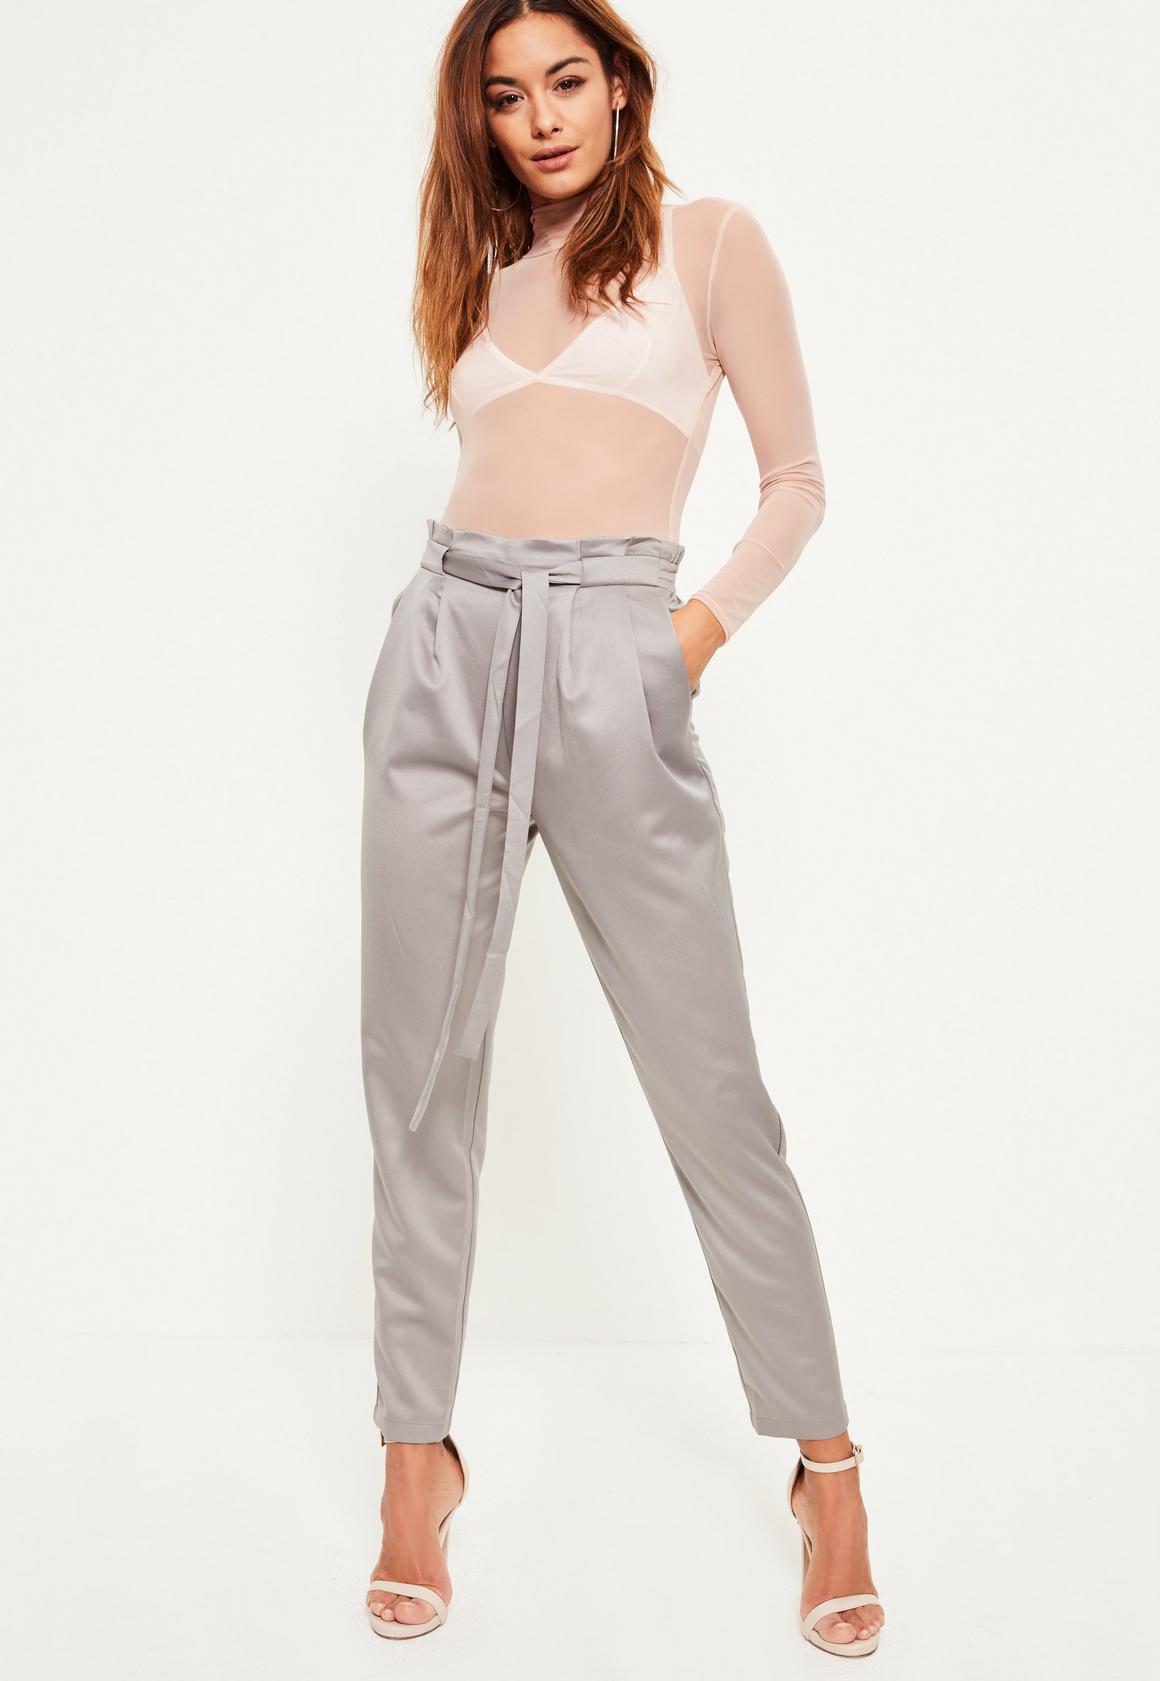 Paper bag trousers - Previous Next